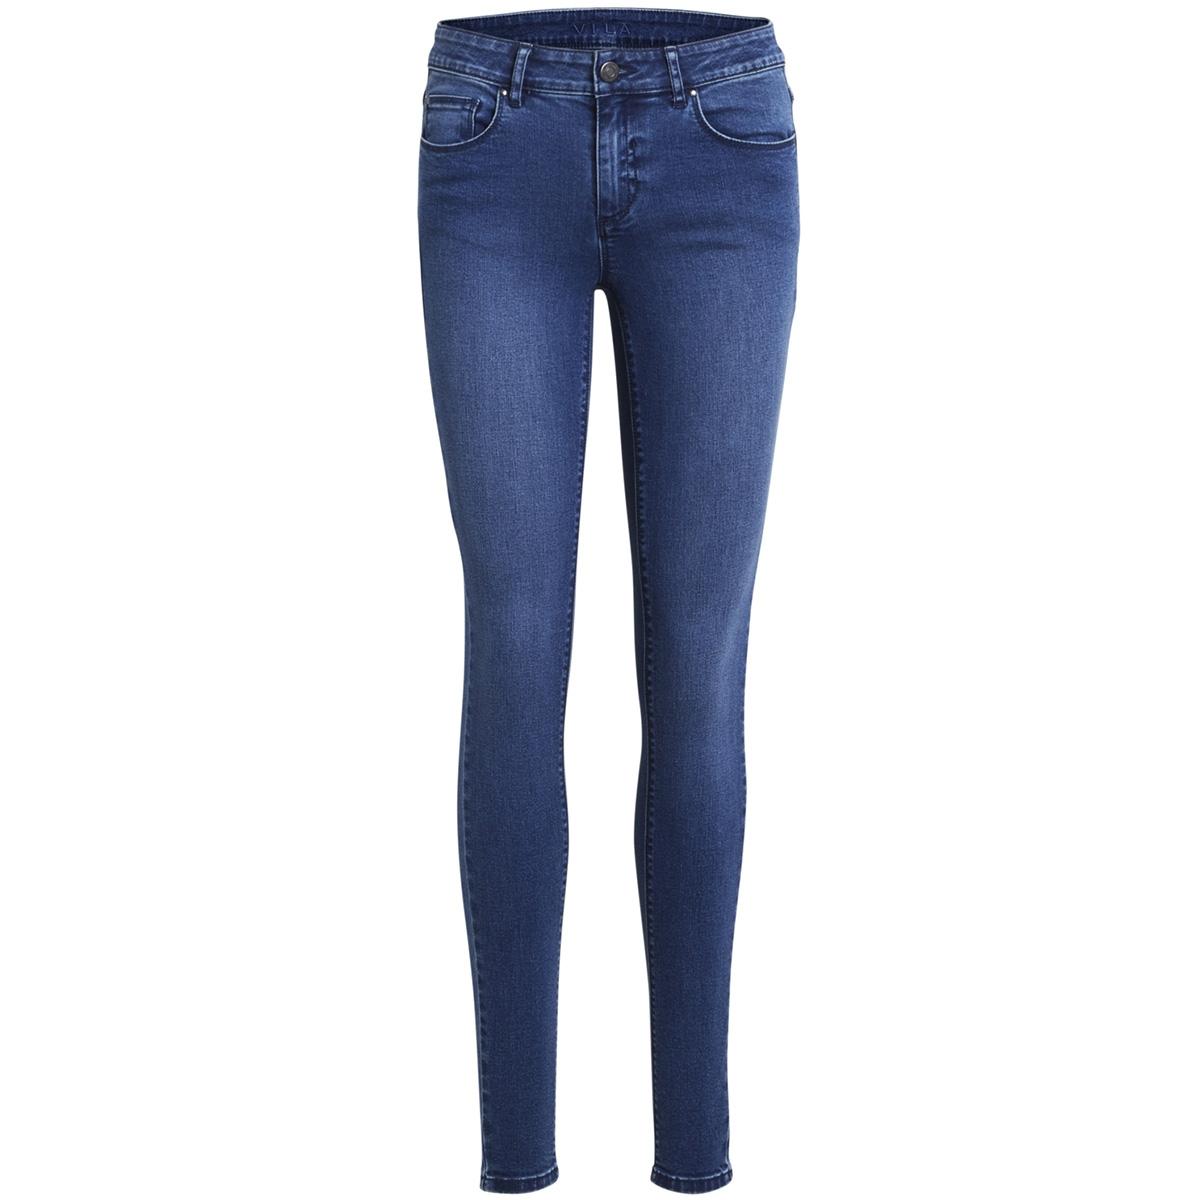 vicommit rw slim mbd-noos 14042595 vila jeans medium blue denim